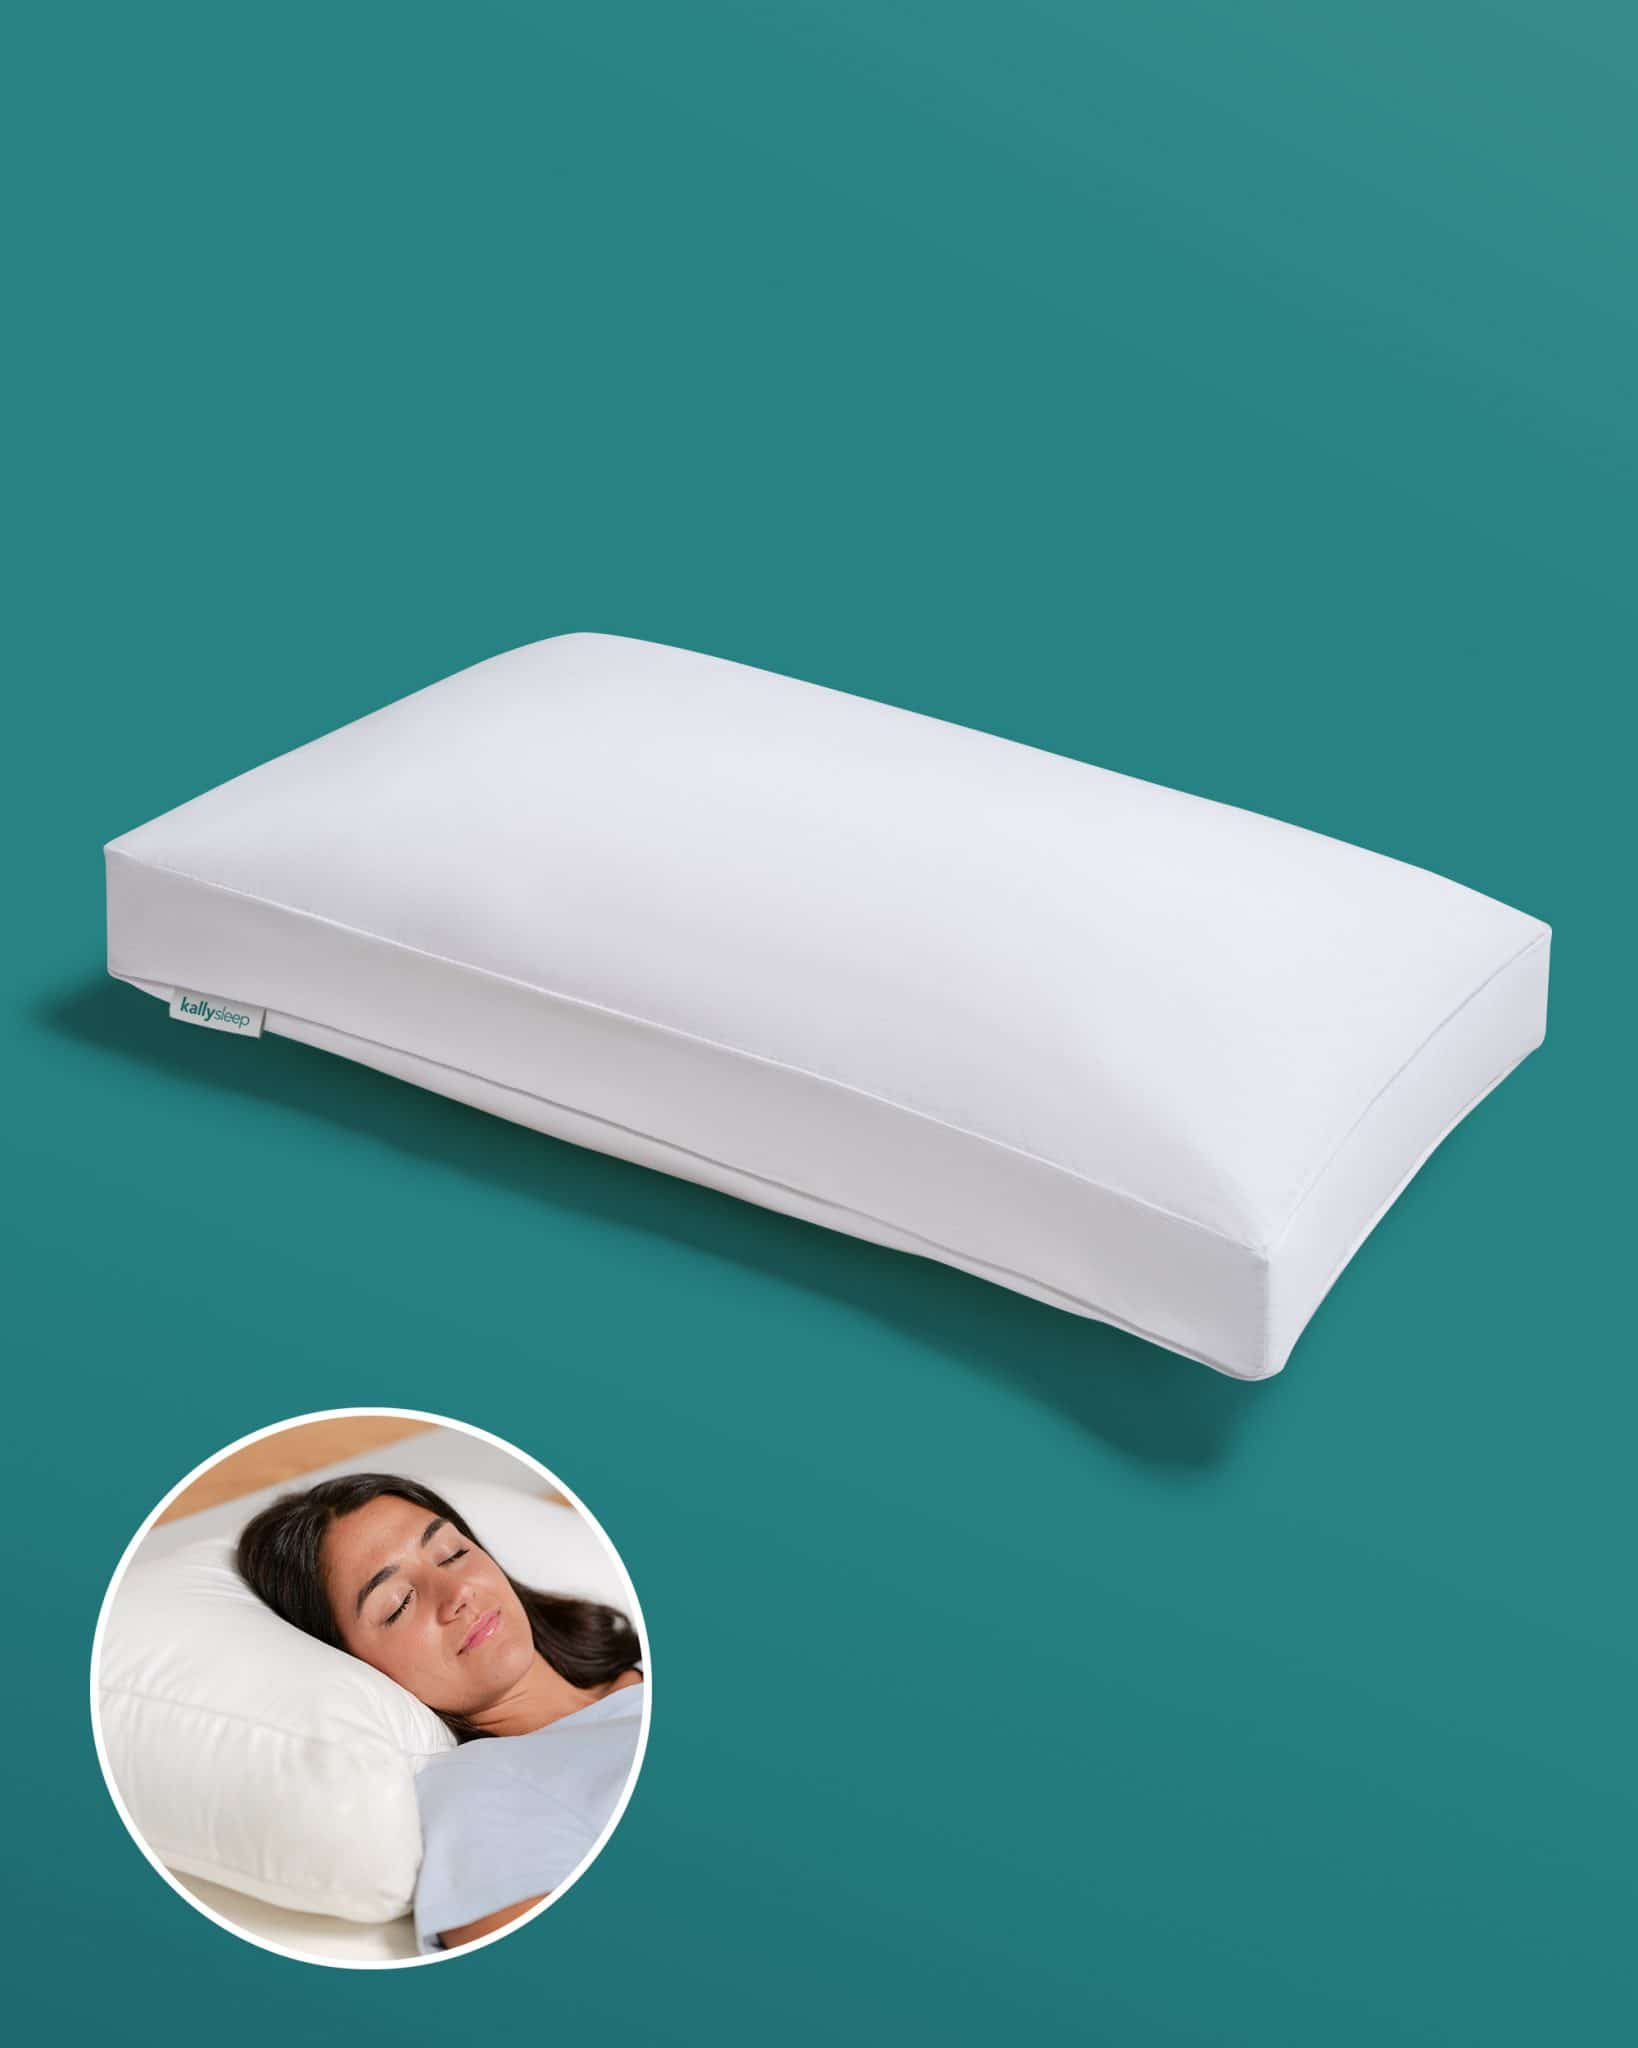 Kally Back Sleeper Pillow